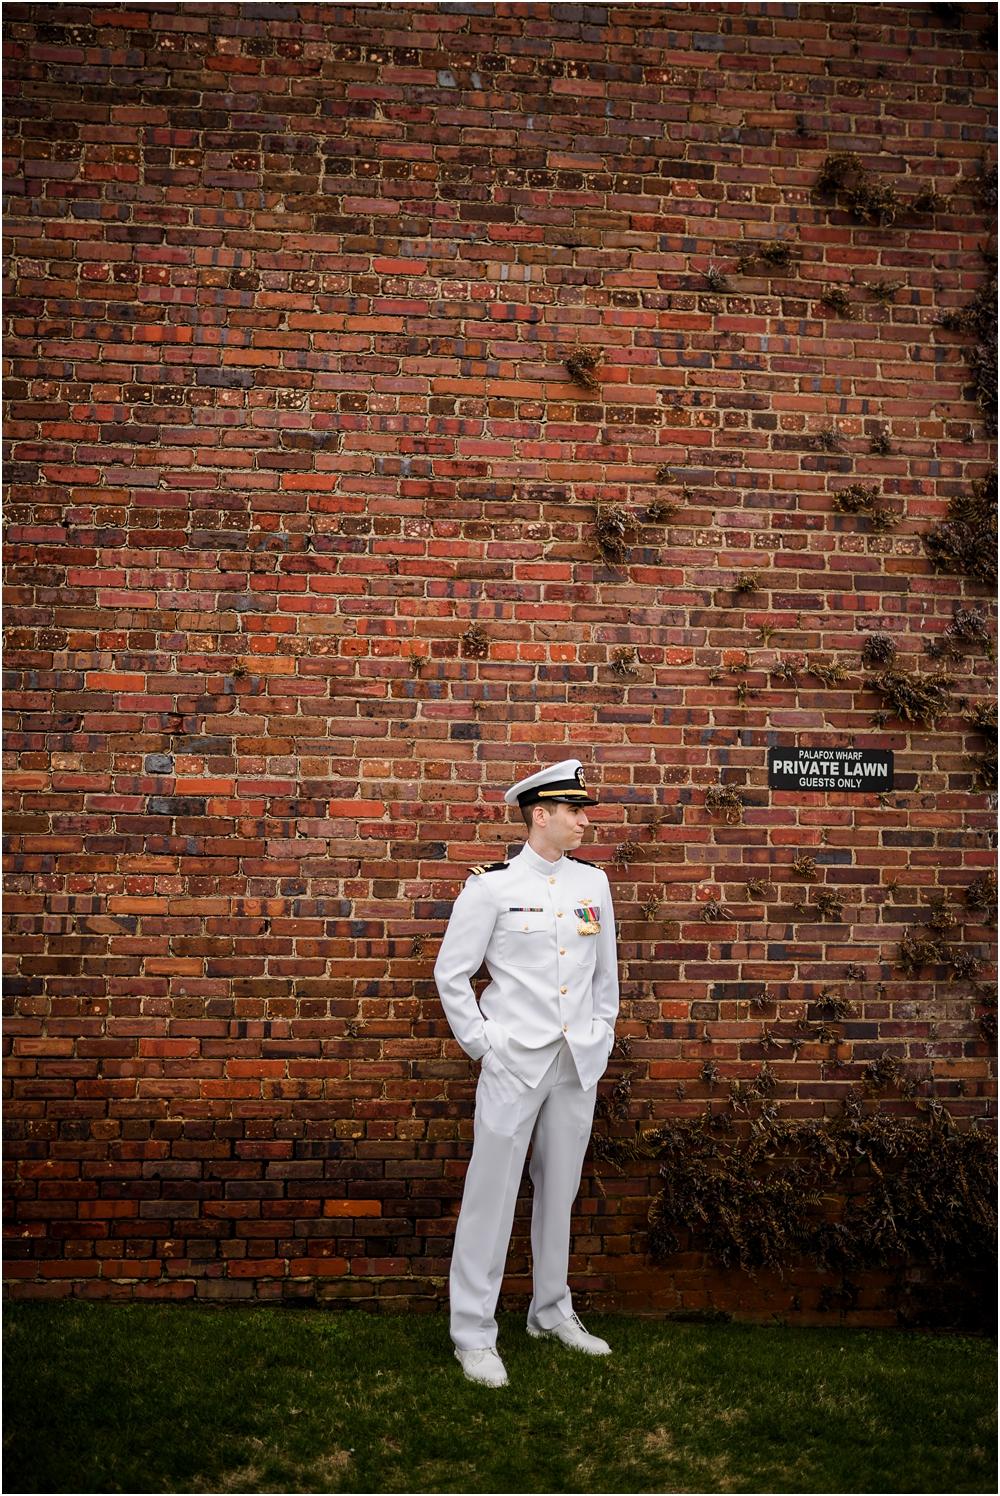 oconnor-pensacola-florida-wedding-photographer-kiersten-taylor-12.jpg